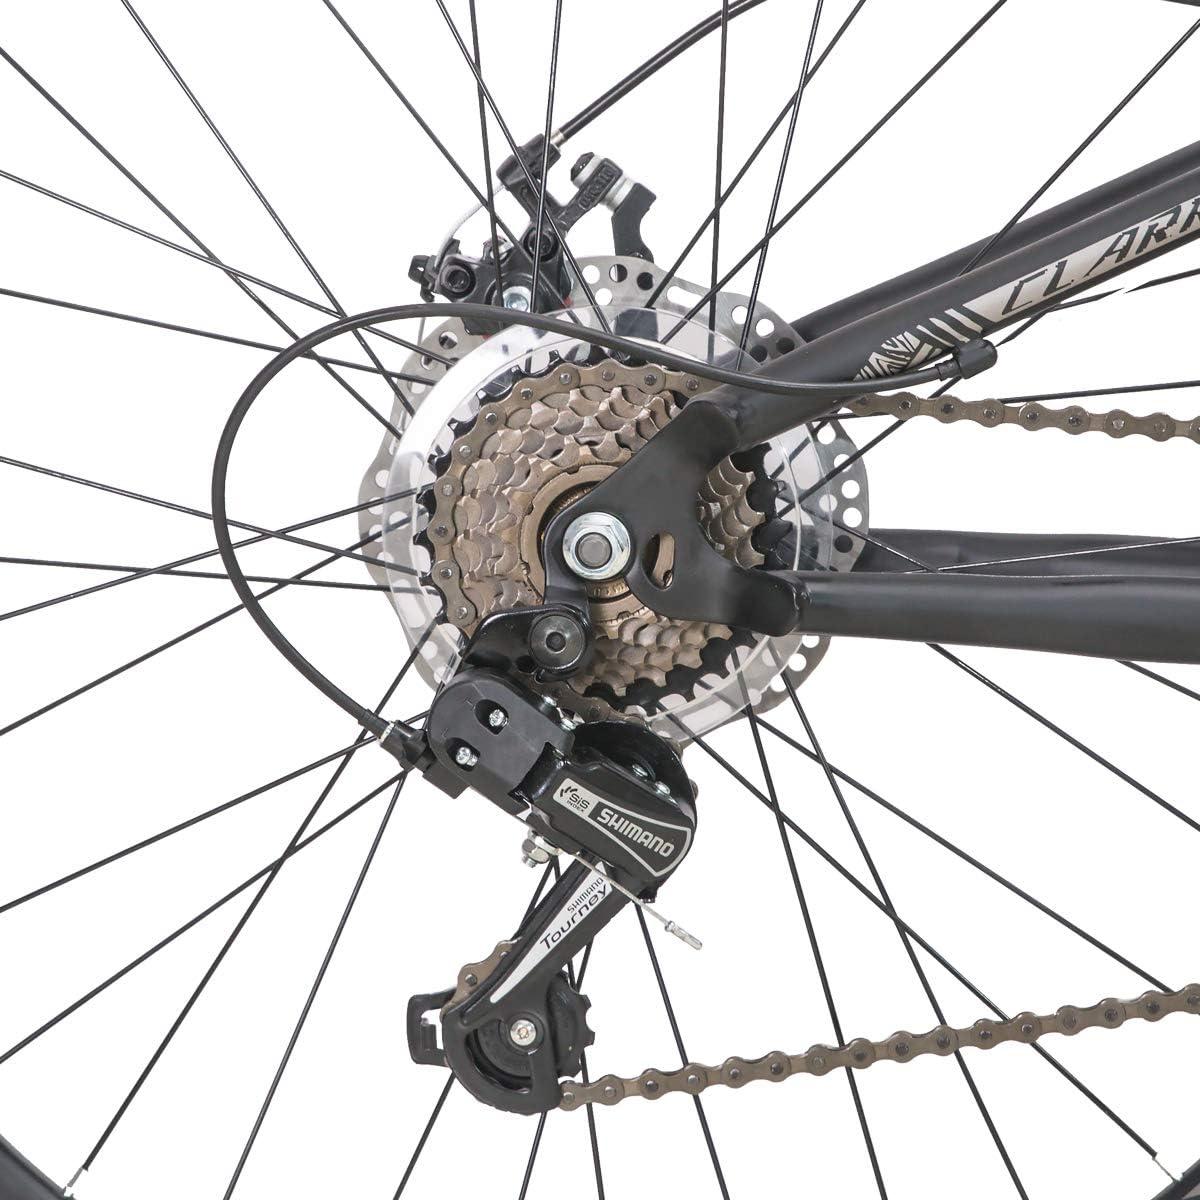 Hiland 26 Zoll Dual-Suspension Mountainbike 21Speed MTB Fahrrad f/ür Herren 18 Zoll